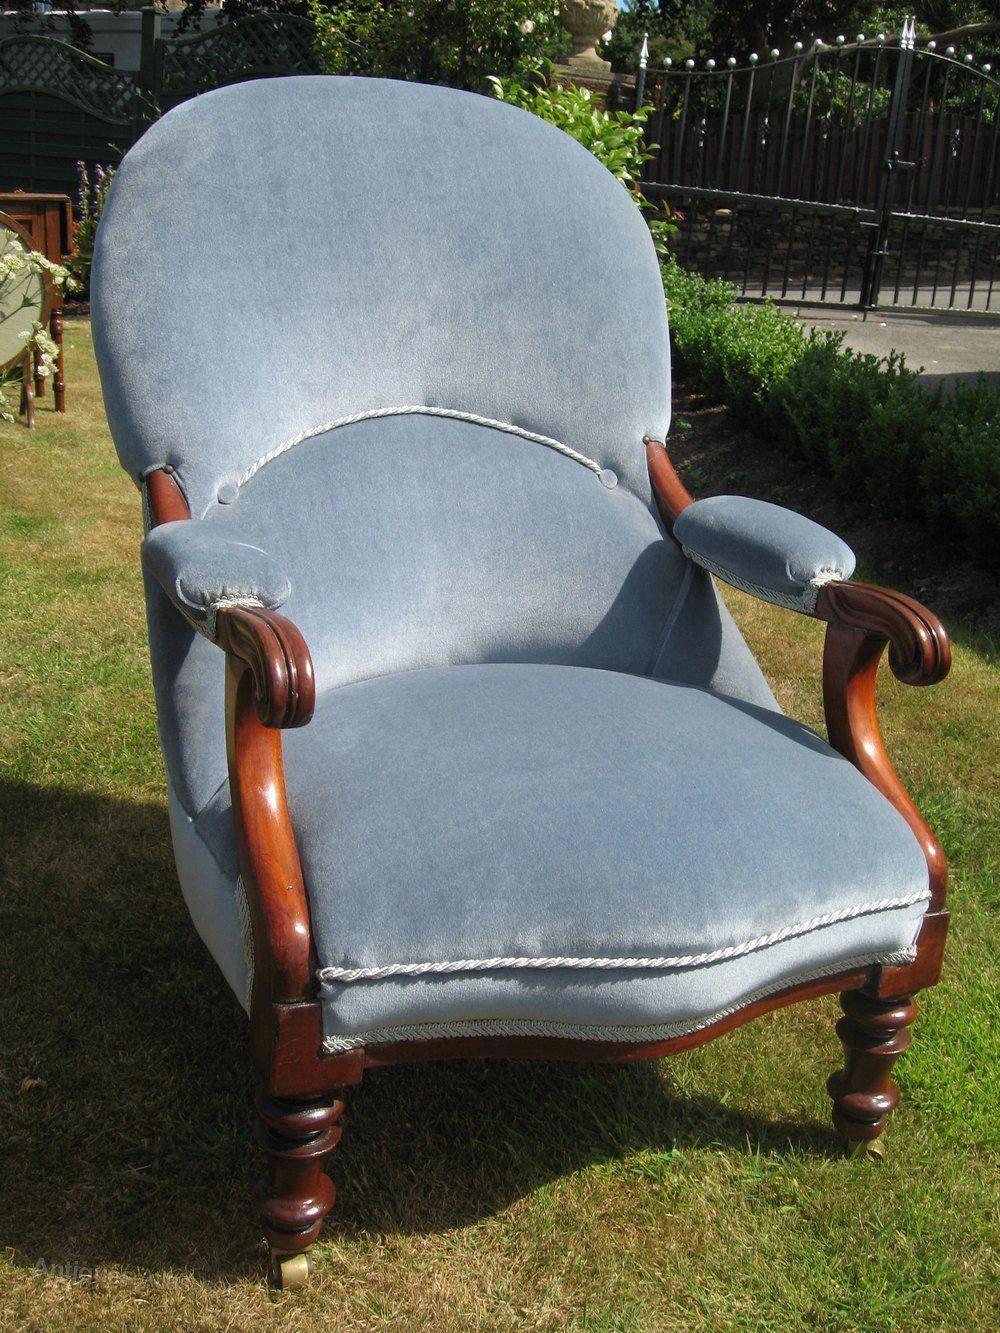 Farmhousediningchairs moviechairs armchair victorian